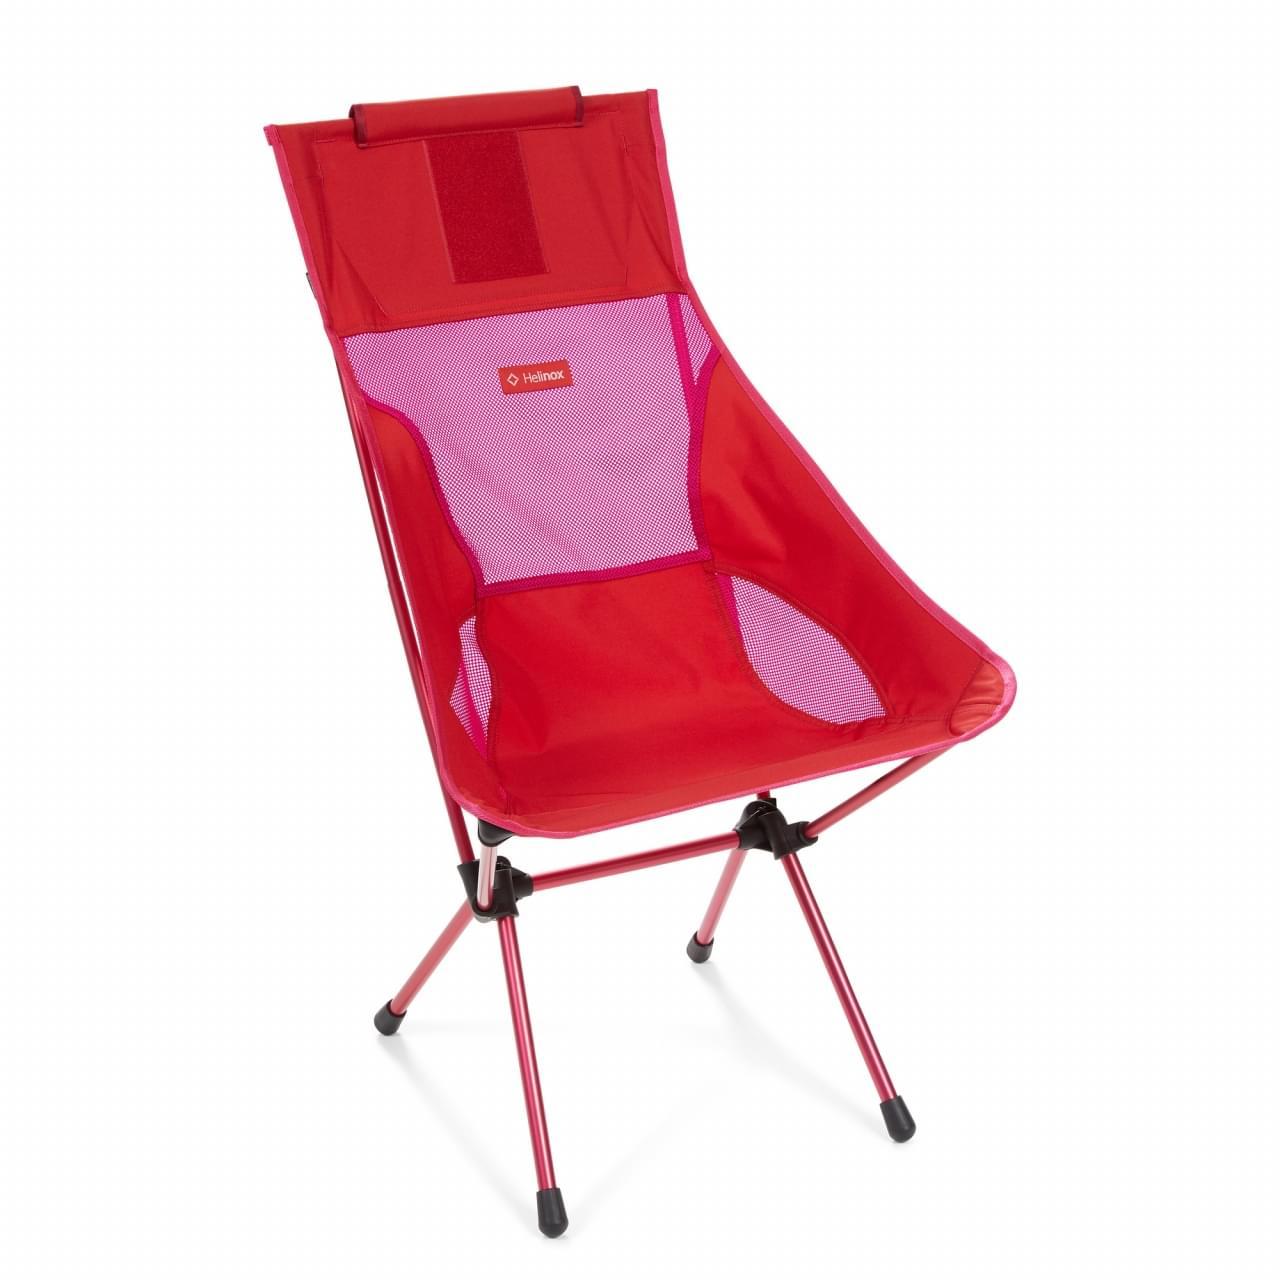 Helinox Sunset Chair Block Lichtgewicht Stoel - Rood